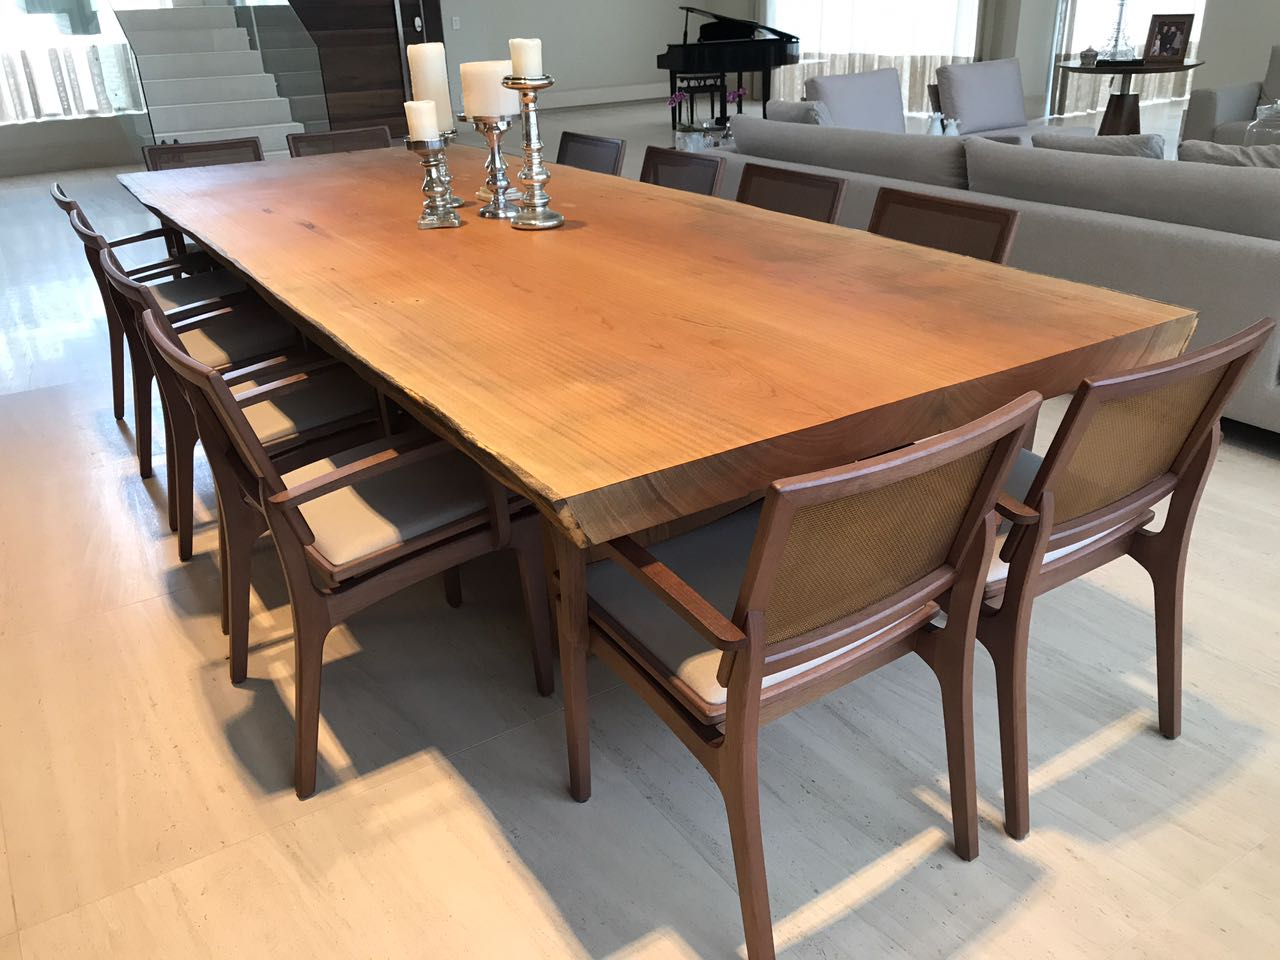 Mesa de Madeira para sala de Jantar